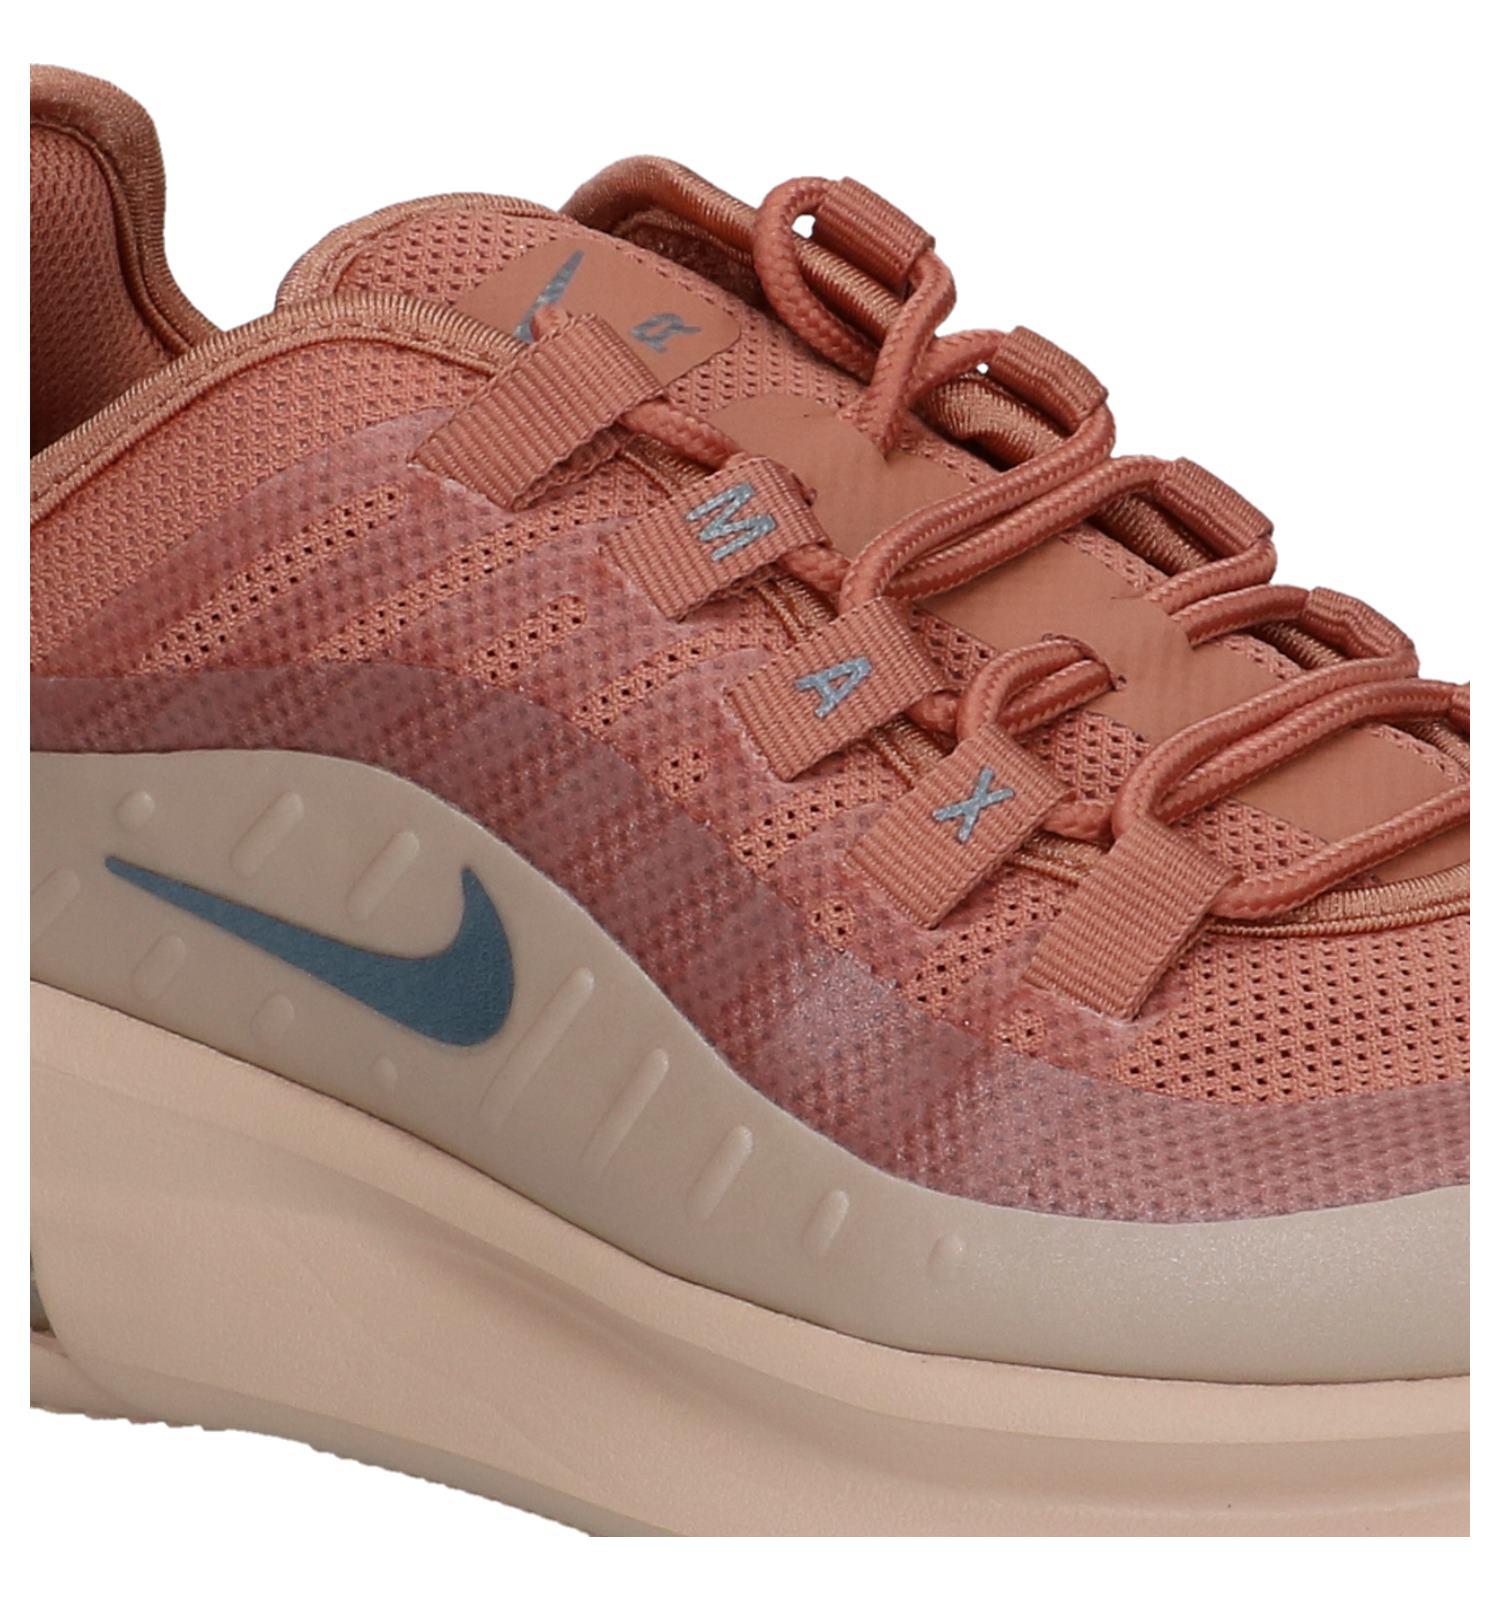 online store d87b2 1c19d Donker Roze Runner Sneakers Nike Air Max Axis   TORFS.BE   Gratis verzend  en retour